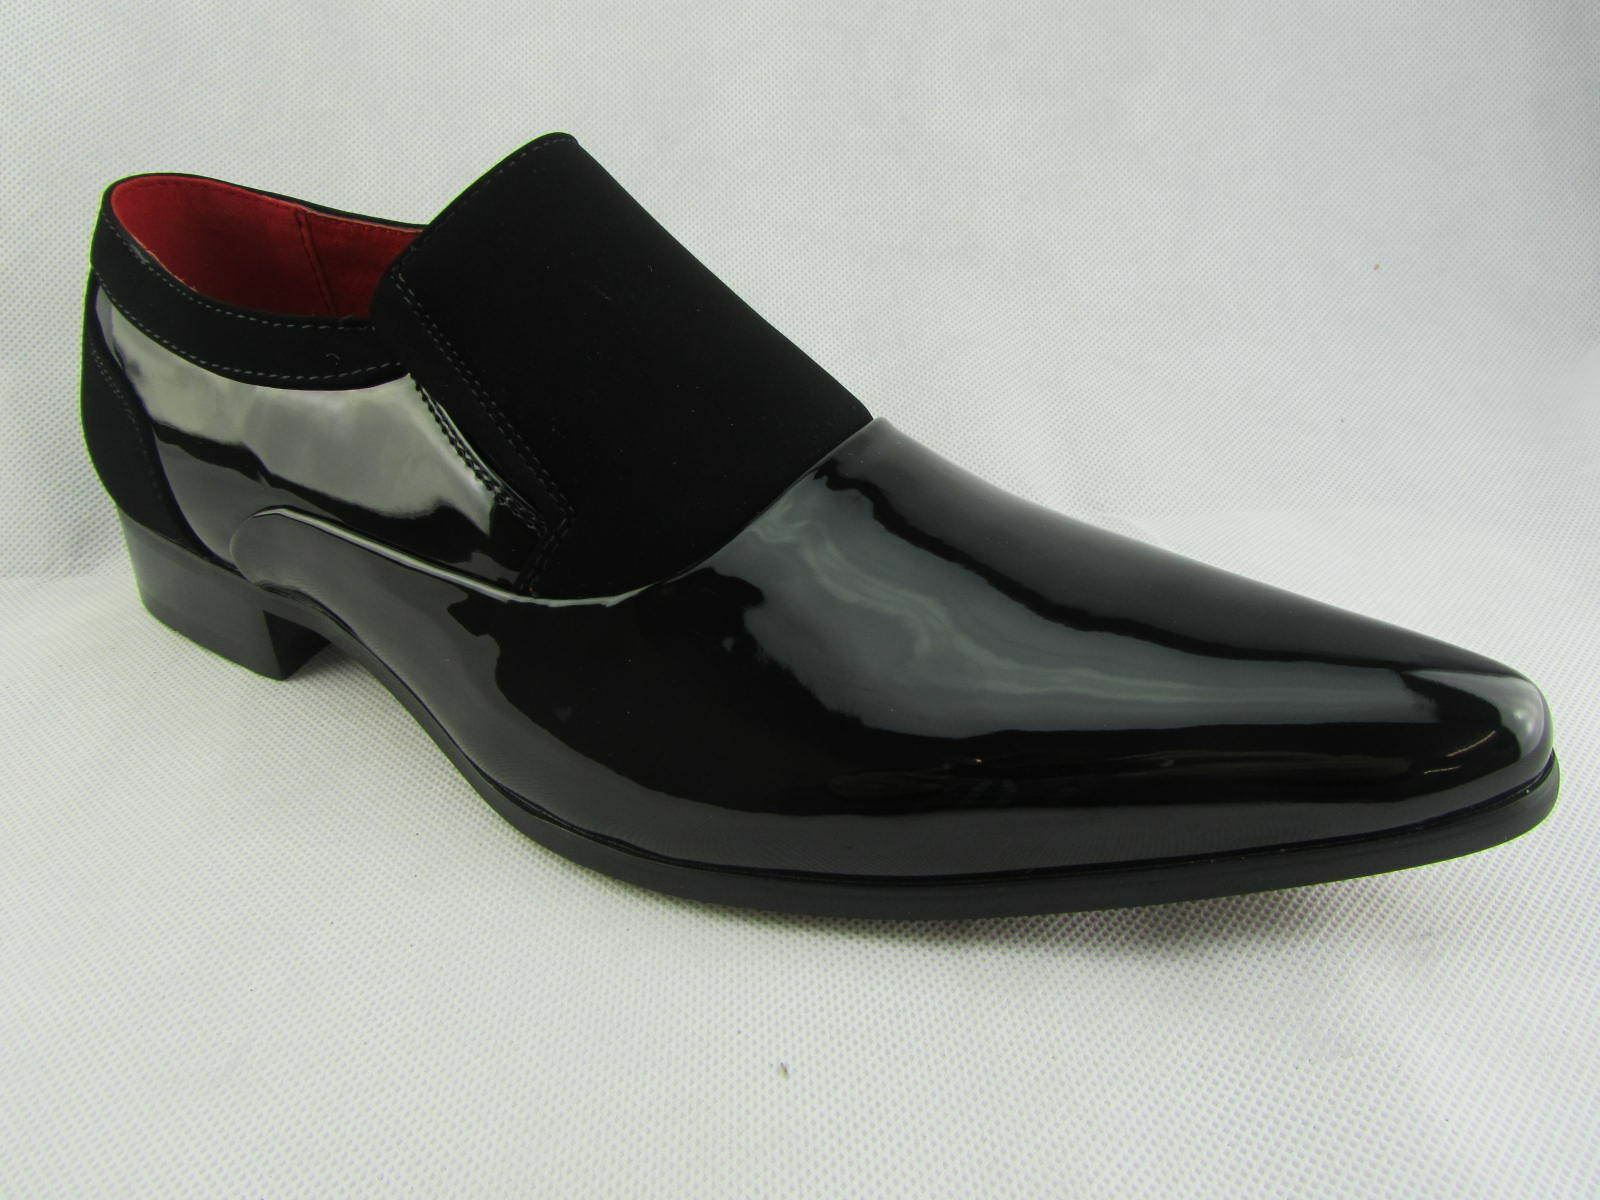 Rossellini Hackney Men Shoes Black Lined Nubuck Leather Lined Black Pointed Slip On Smart c8e5ec